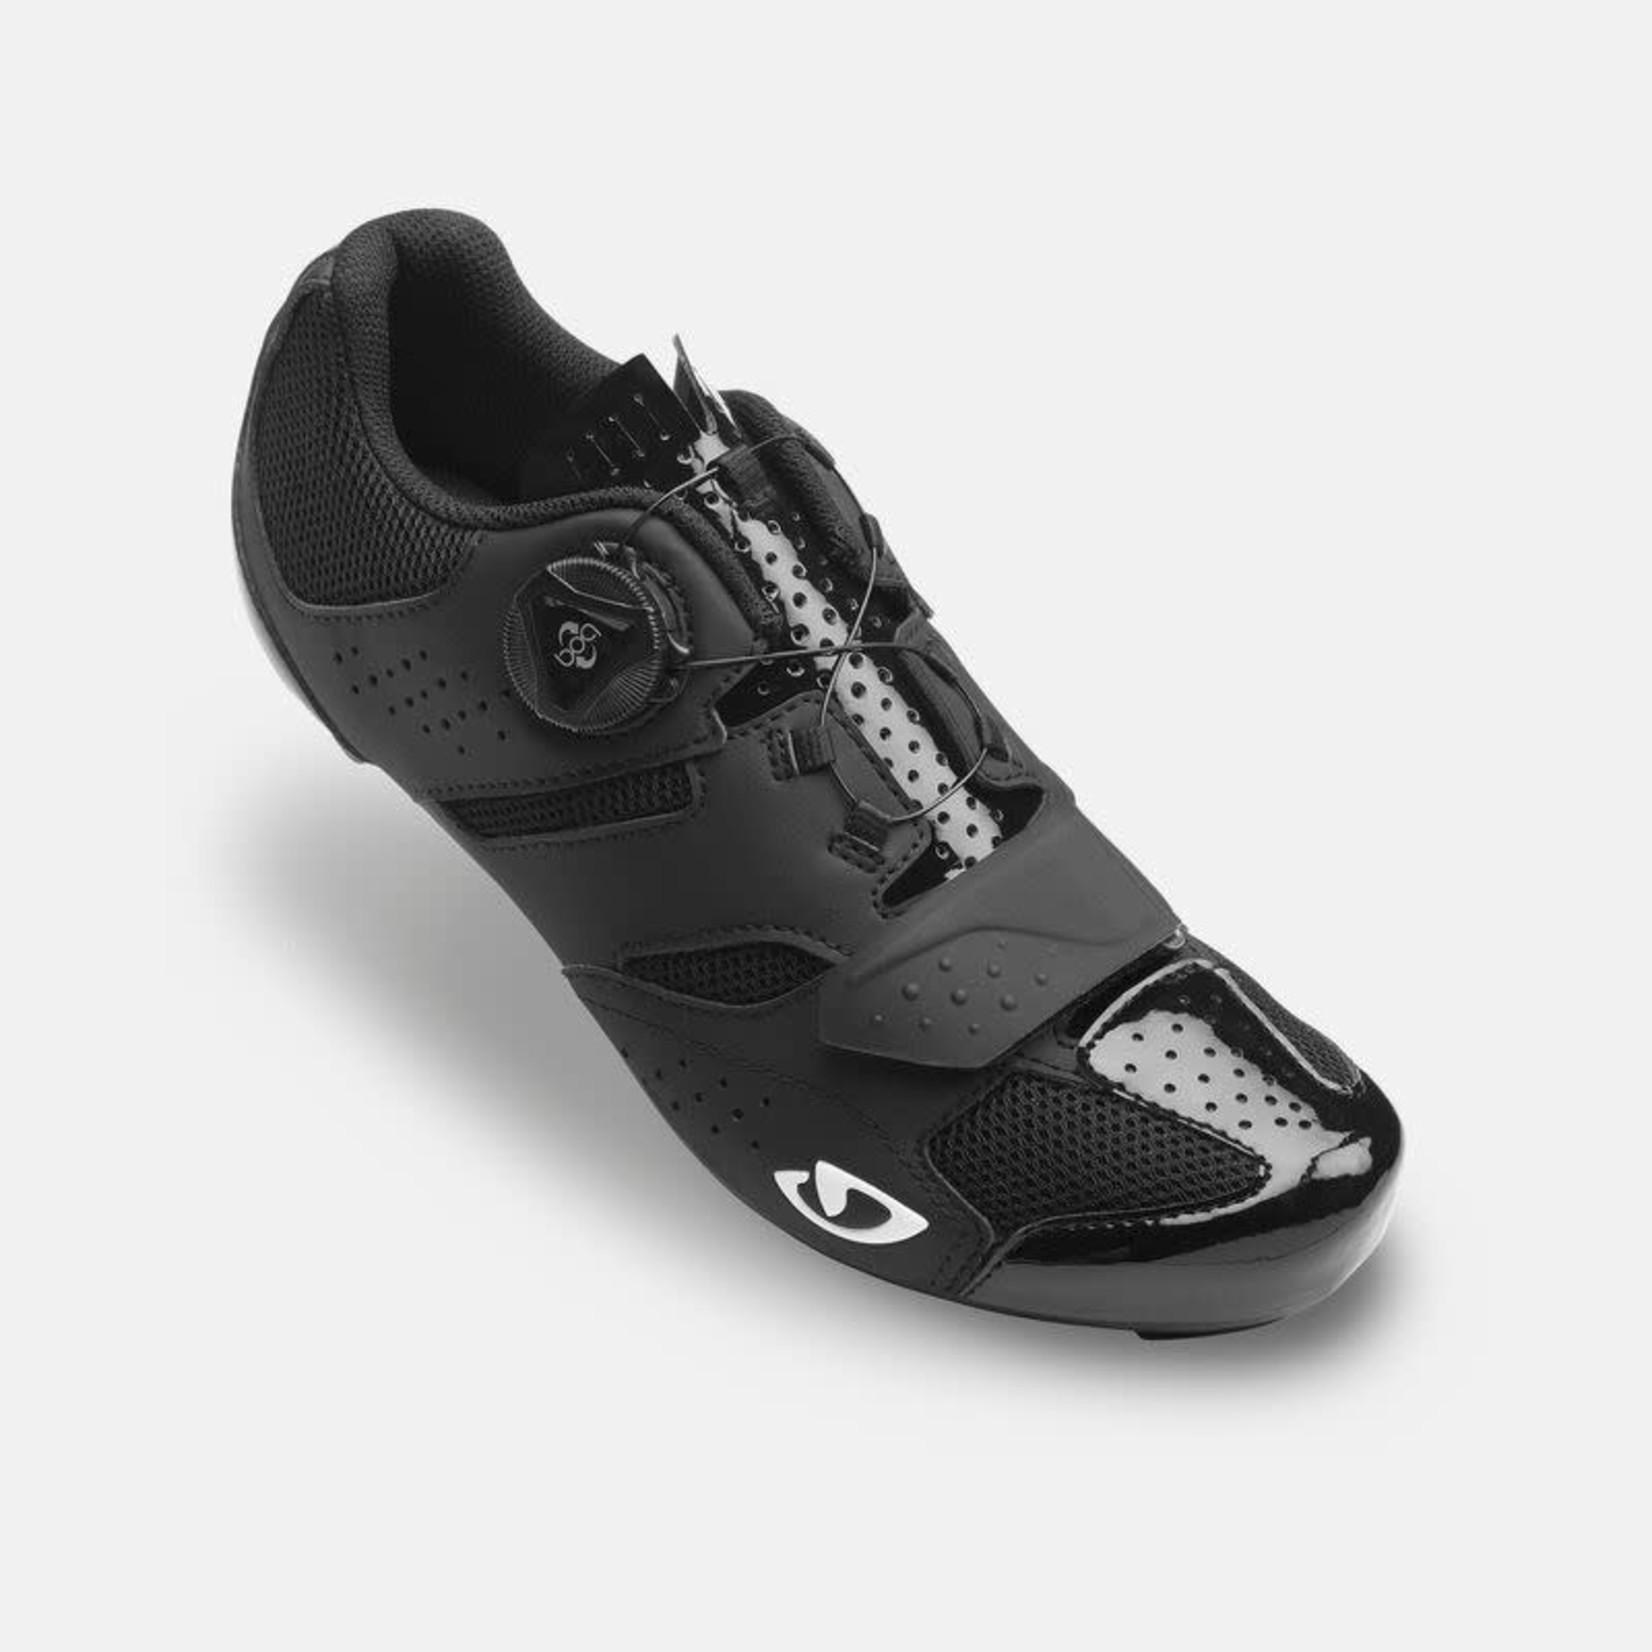 Giro Giro Savix W Shoe